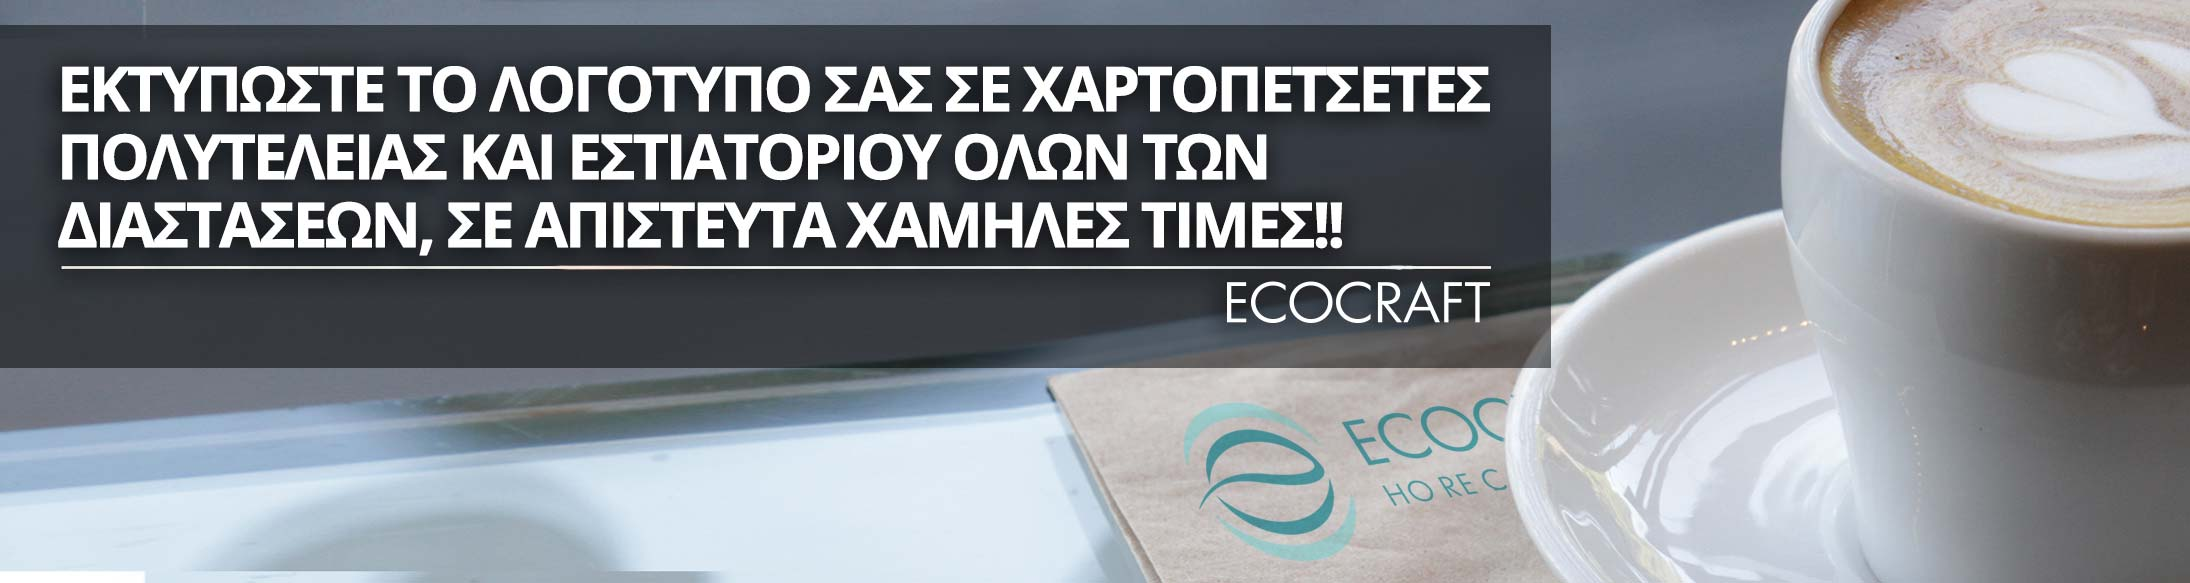 ECOCRAFT | Εκτυπώστε το Λογότυπό σας σε Χαρτοπετσέτες Πολυτελείας & Εστιατορίου